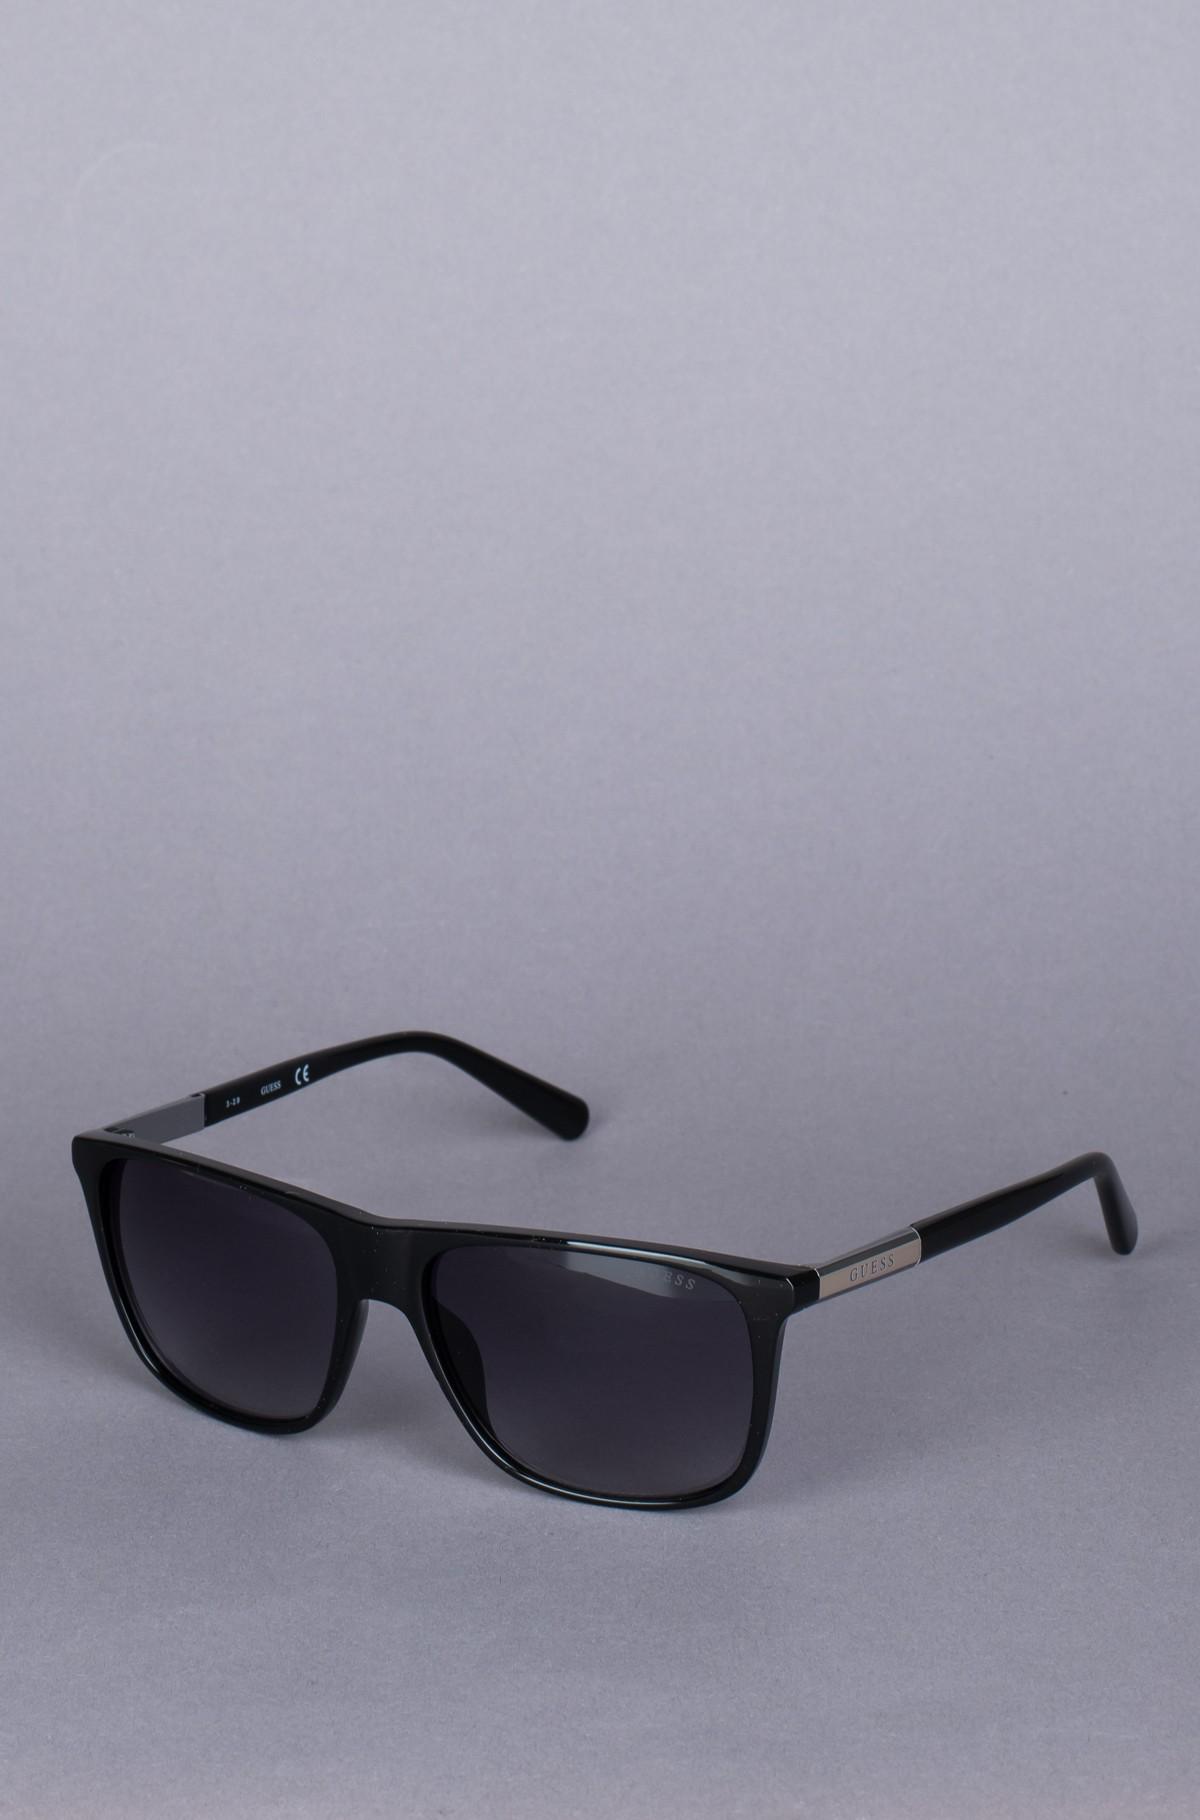 Sunglasses 6957-full-1